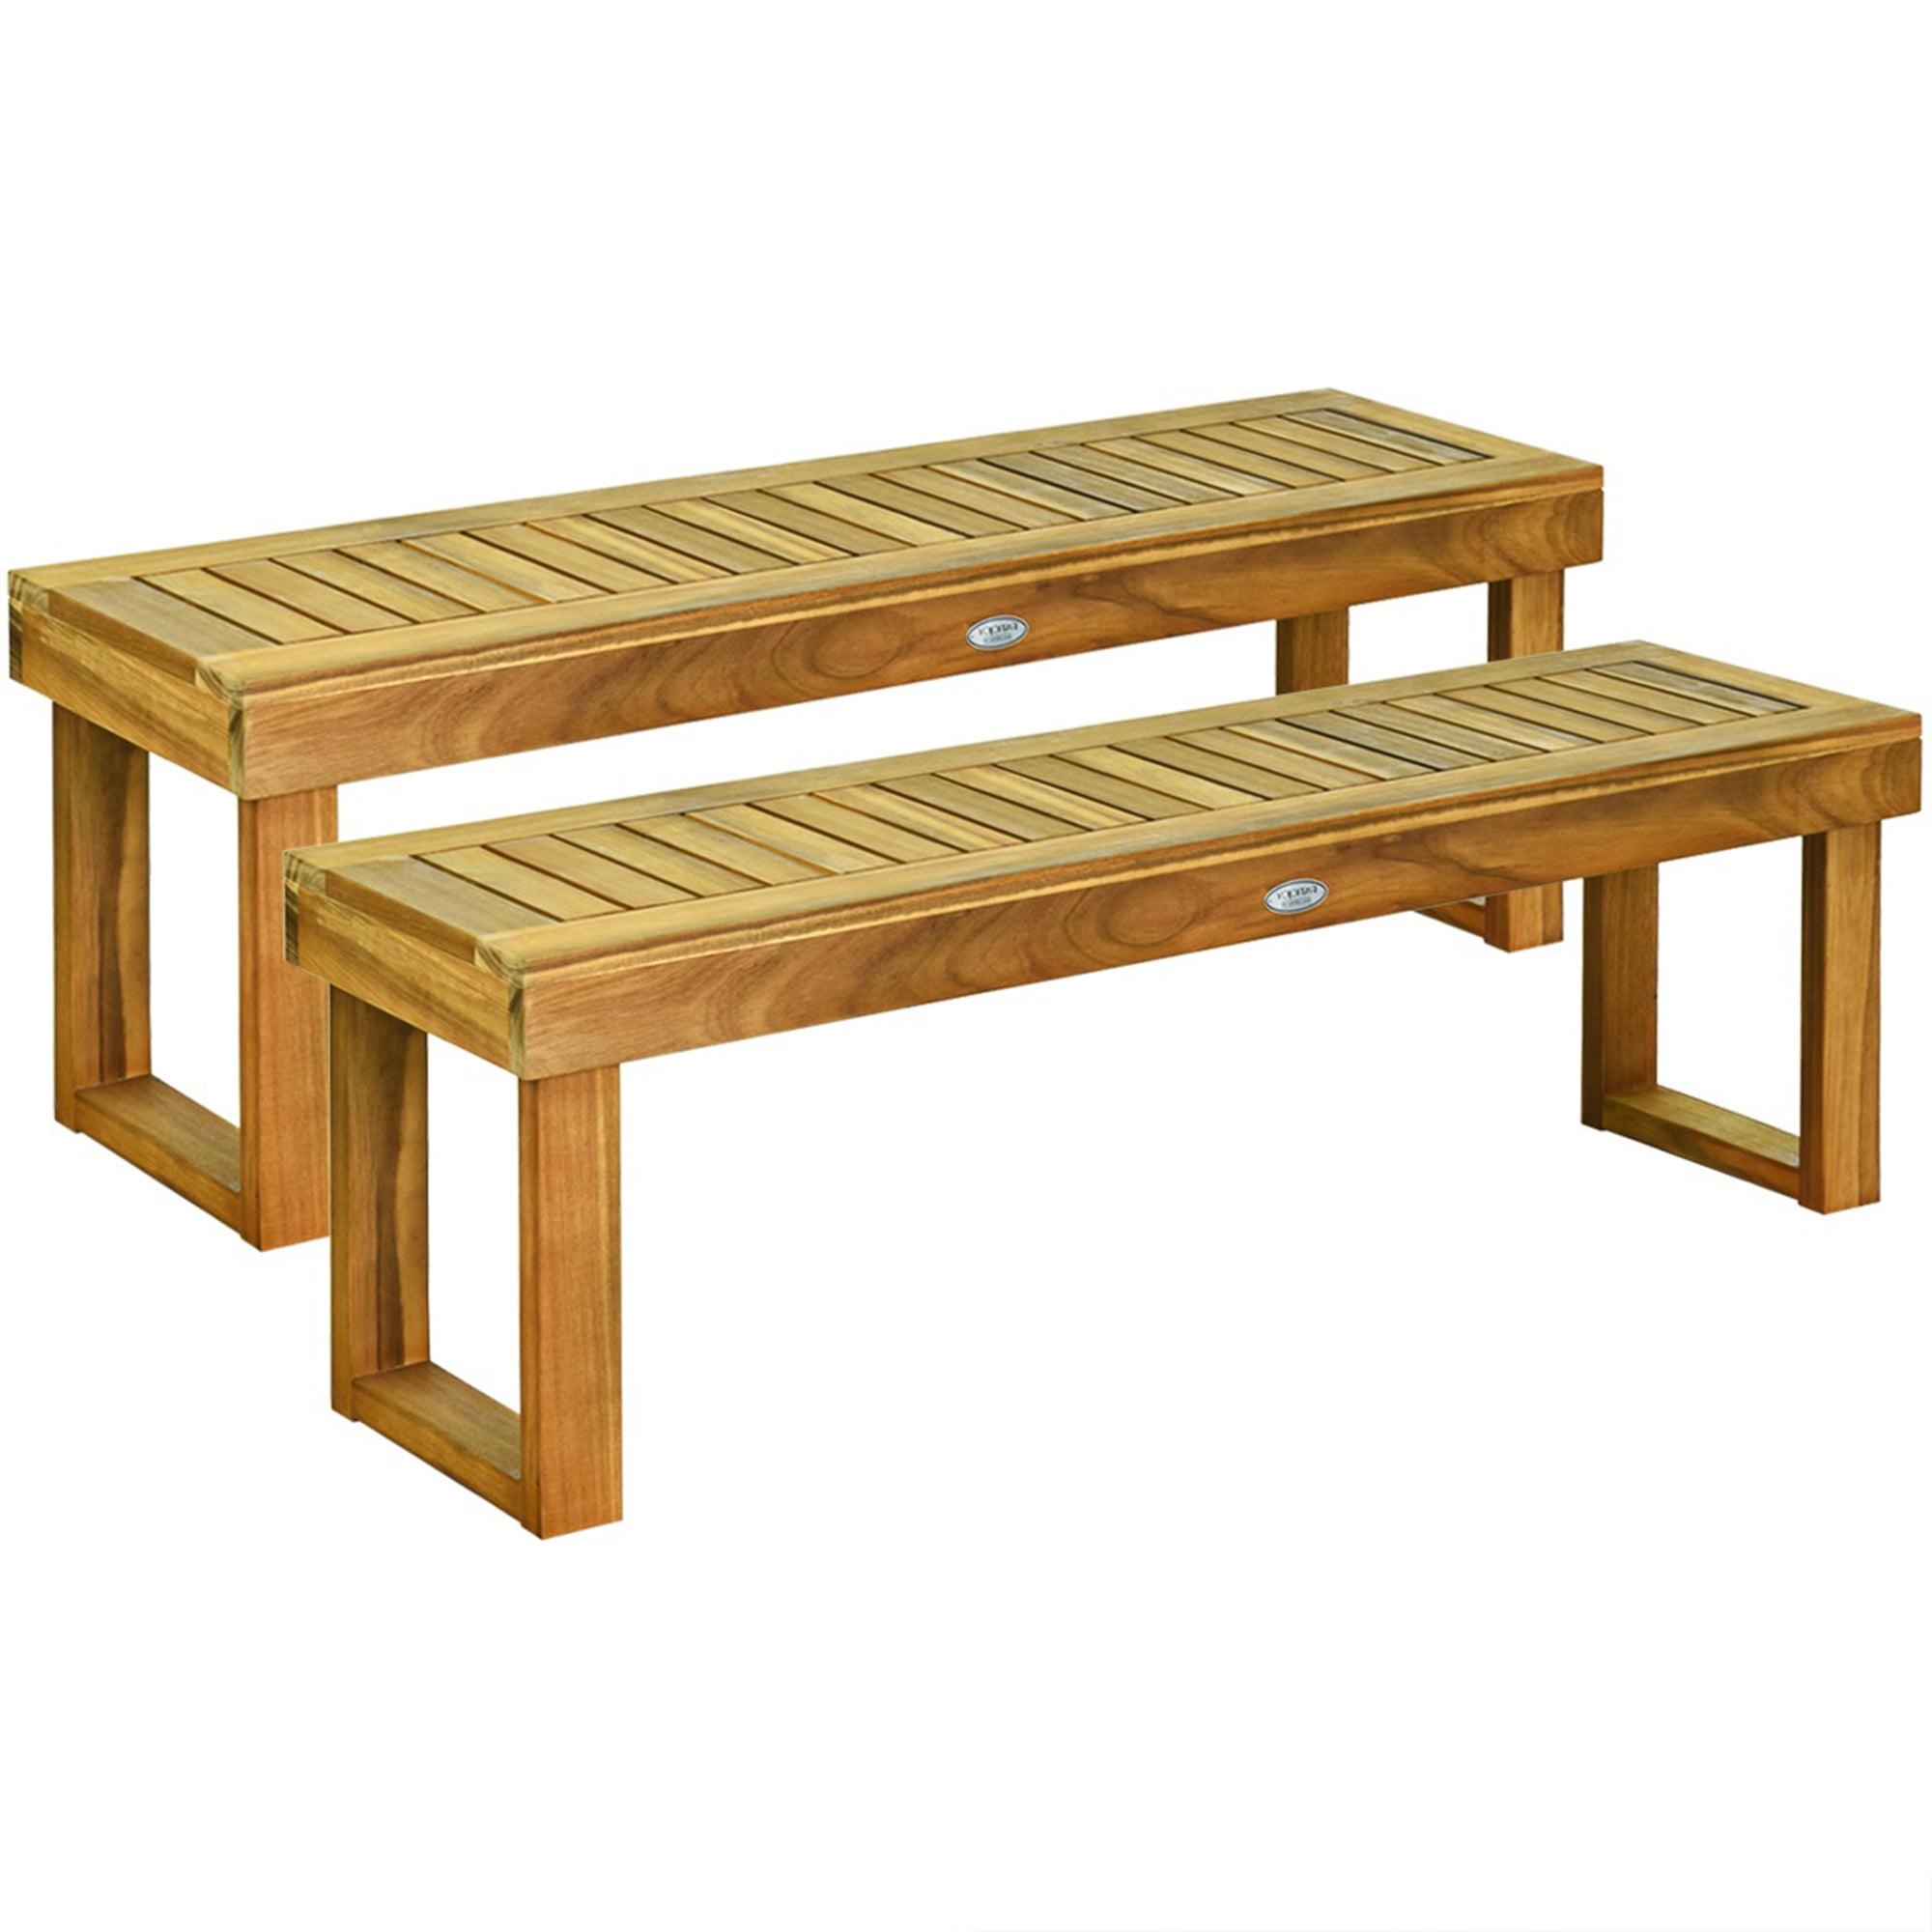 Gymax Set Of 2 Acacia Wood Bench Dining Bench Patio Garden W Slatted Seat Teak Walmart Canada